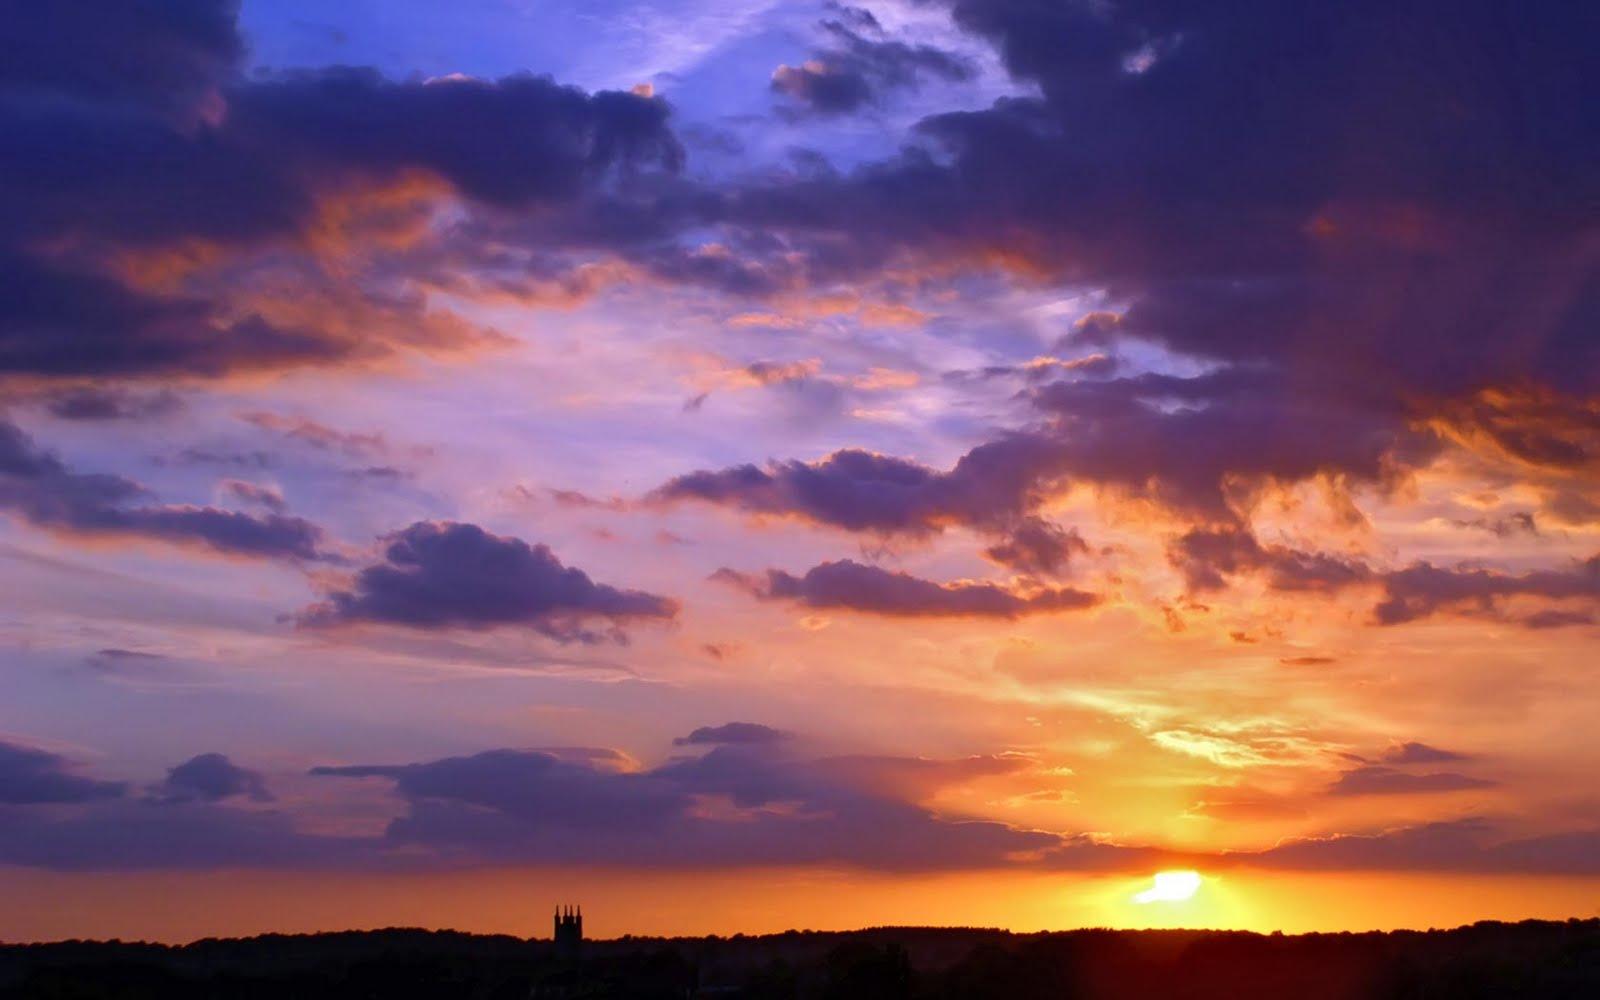 Blue sky sky clouds sky wallpaper sky background night sky